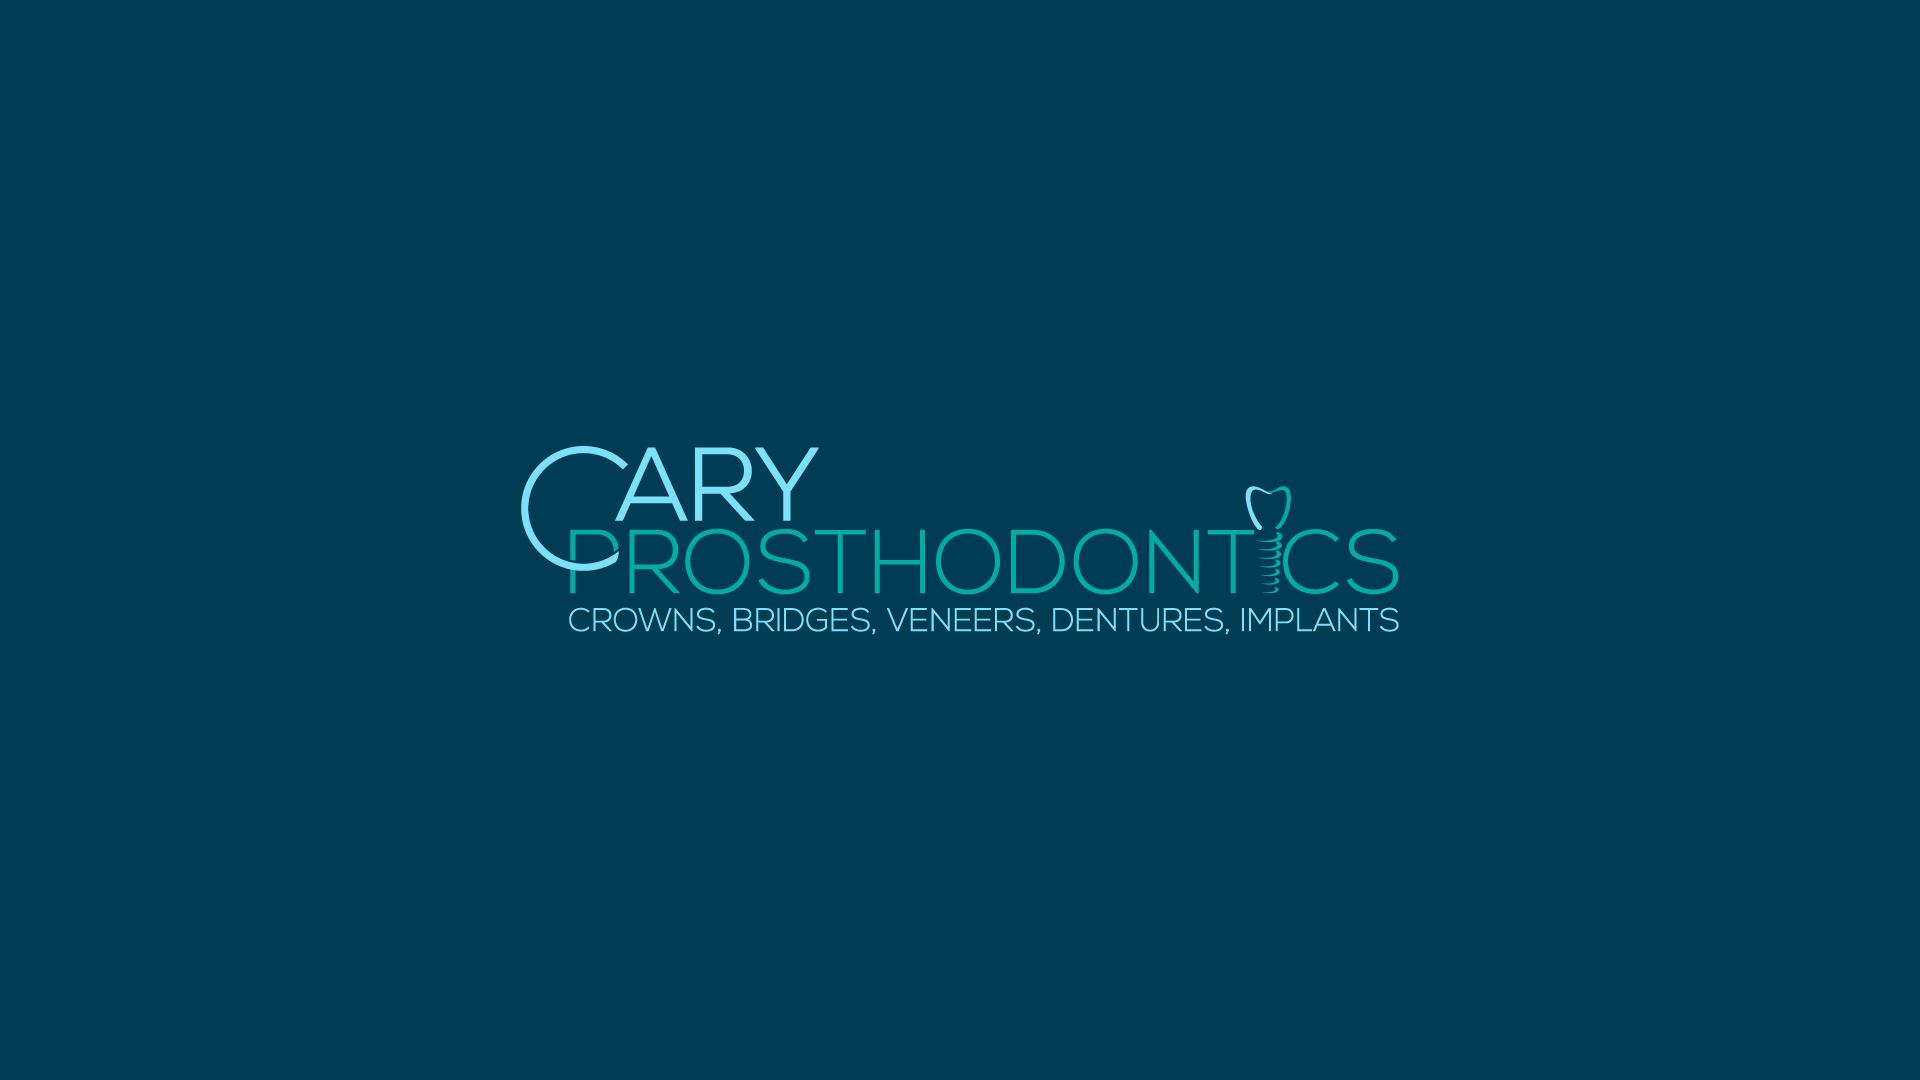 Logo Design by MD SHOHIDUL ISLAM - Entry No. 209 in the Logo Design Contest Cary Prosthodontics Logo Design.